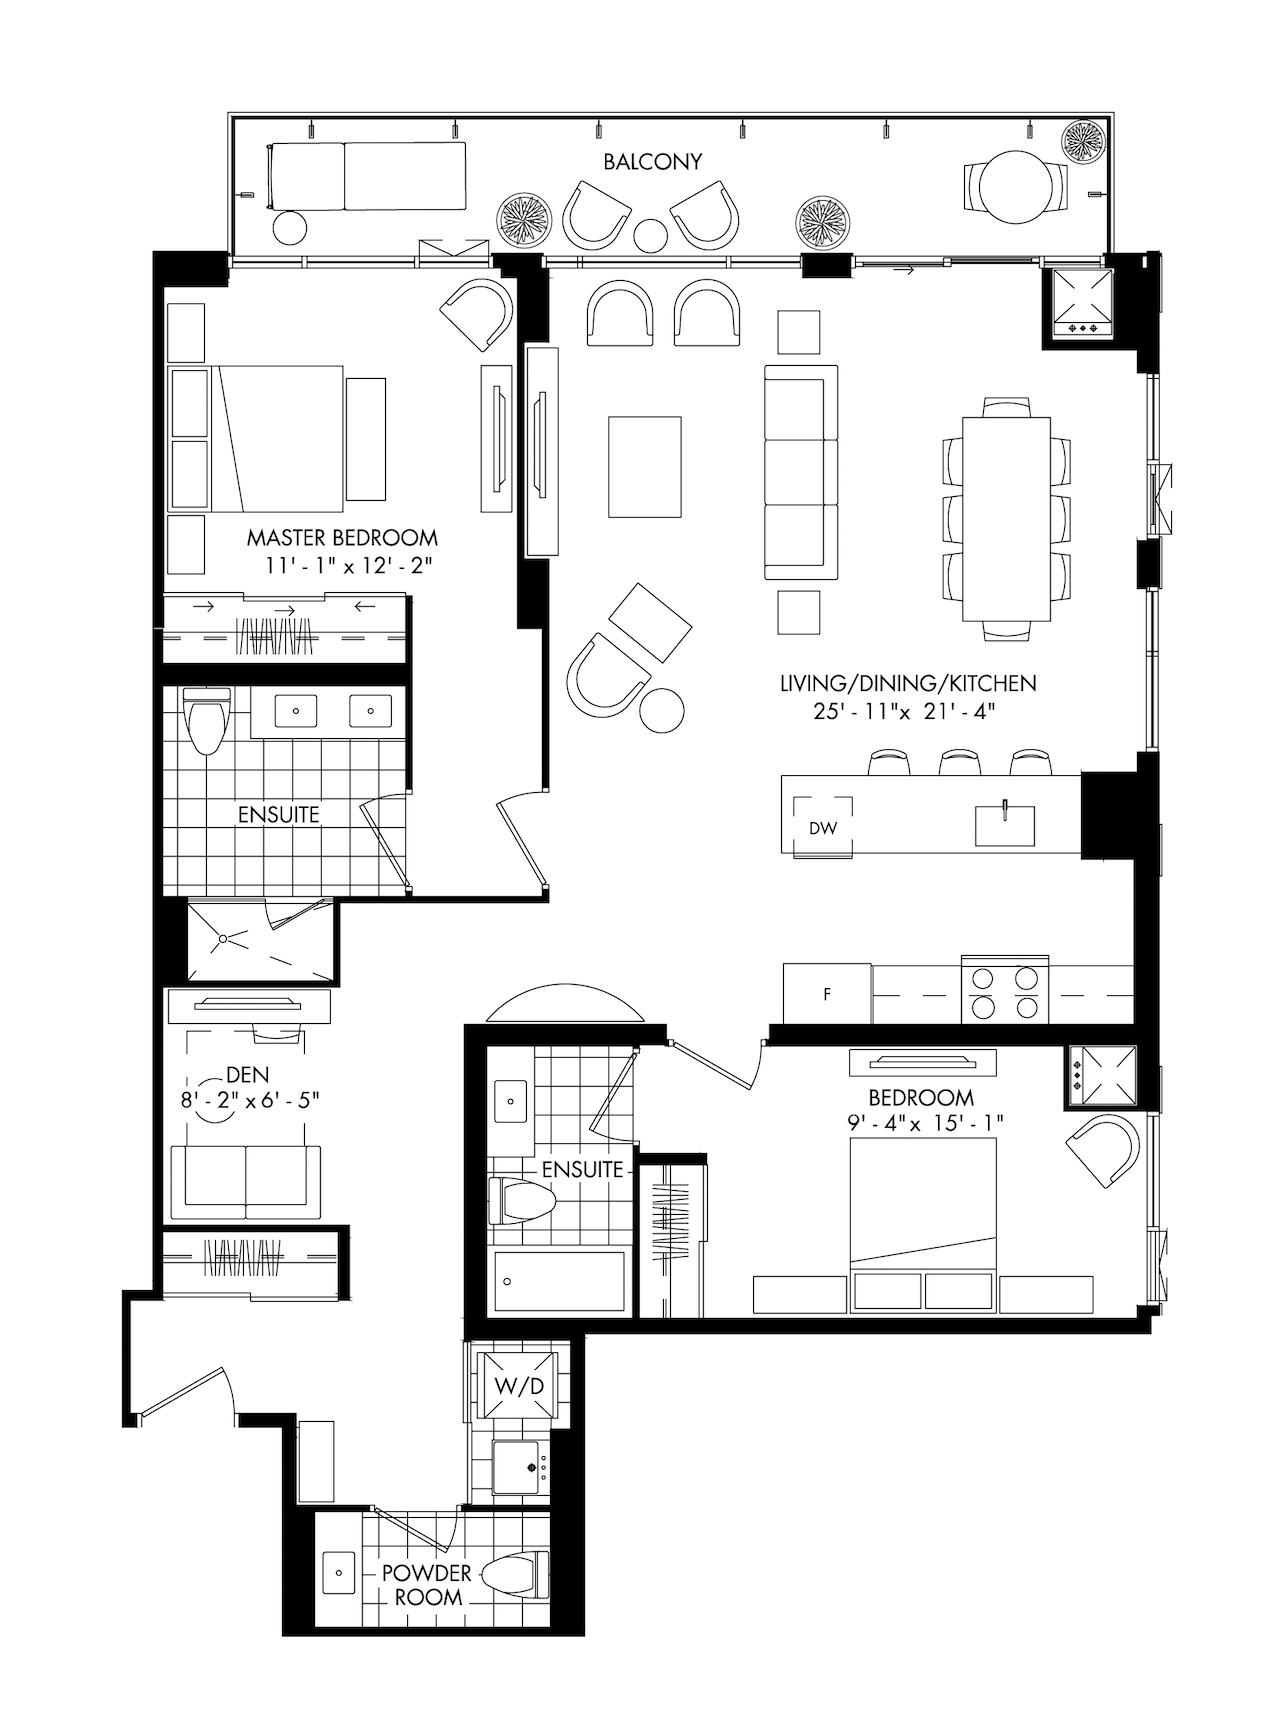 Range Of Suite Layouts Offered At Plaza S Bijou On Bloor Condominium Urbantoronto